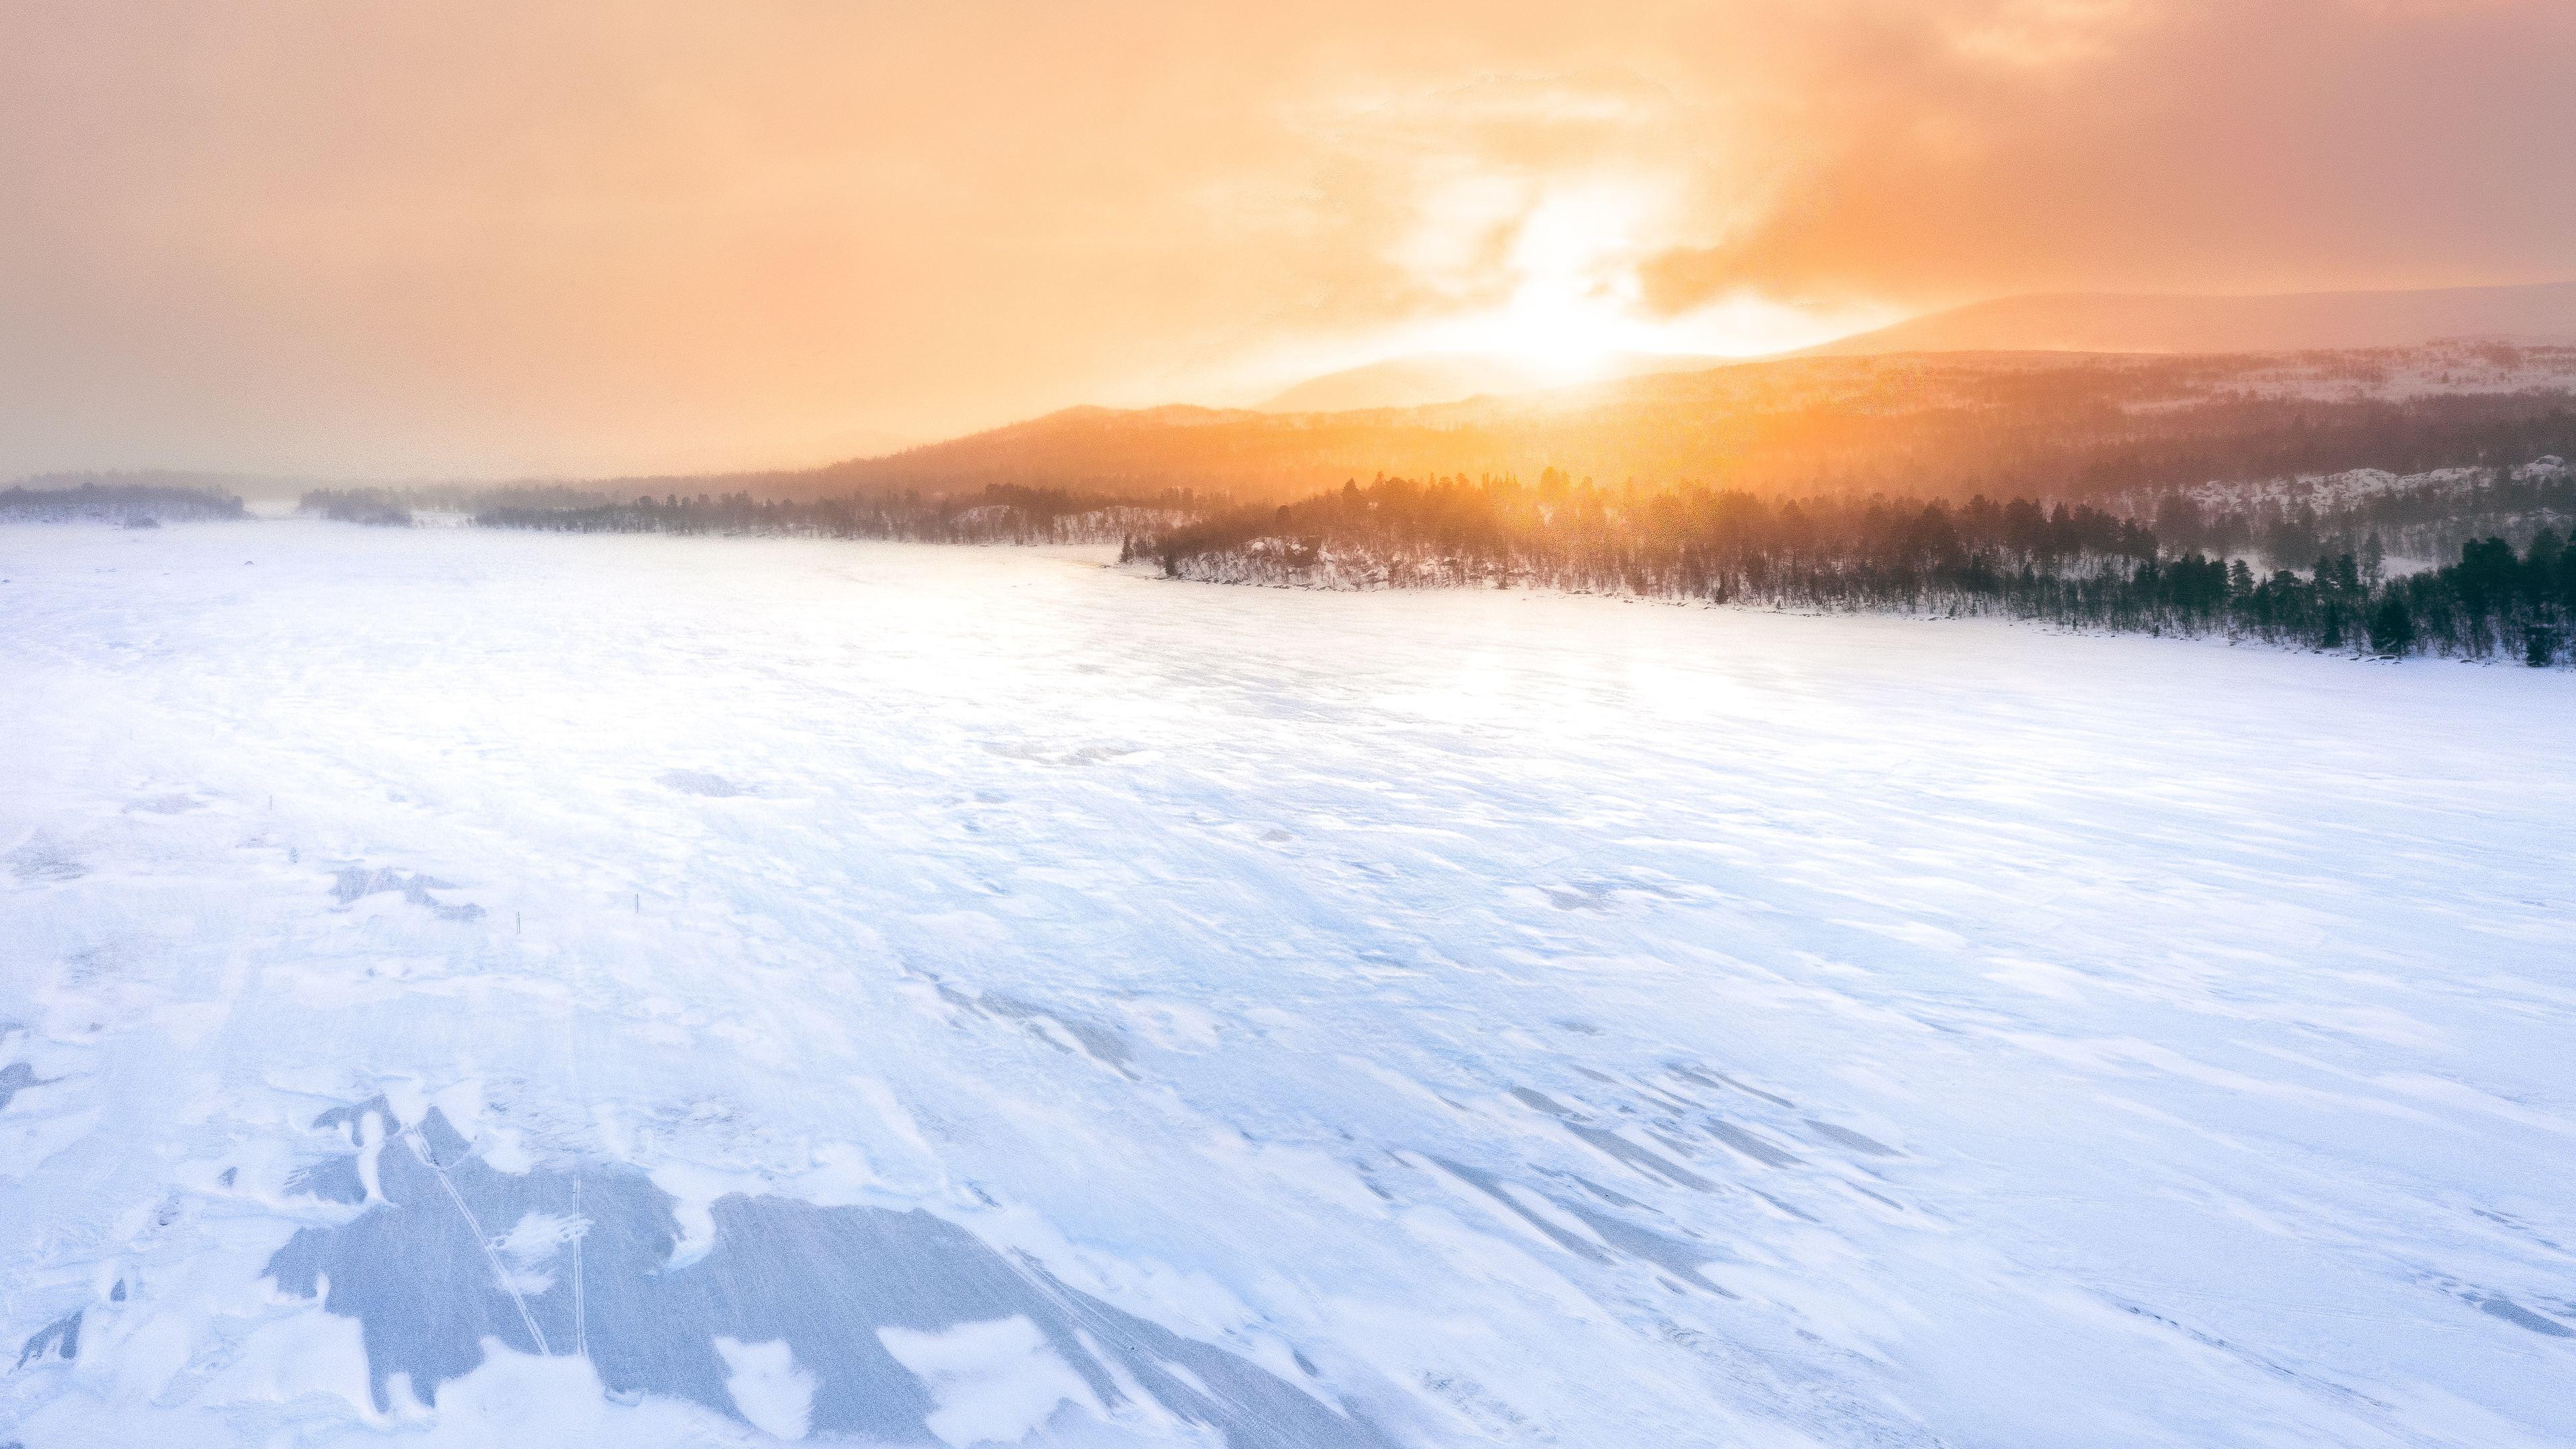 frozen lake 1551644512 - Frozen Lake - nature wallpapers, lake wallpapers, hd-wallpapers, frozen wallpapers, 4k-wallpapers